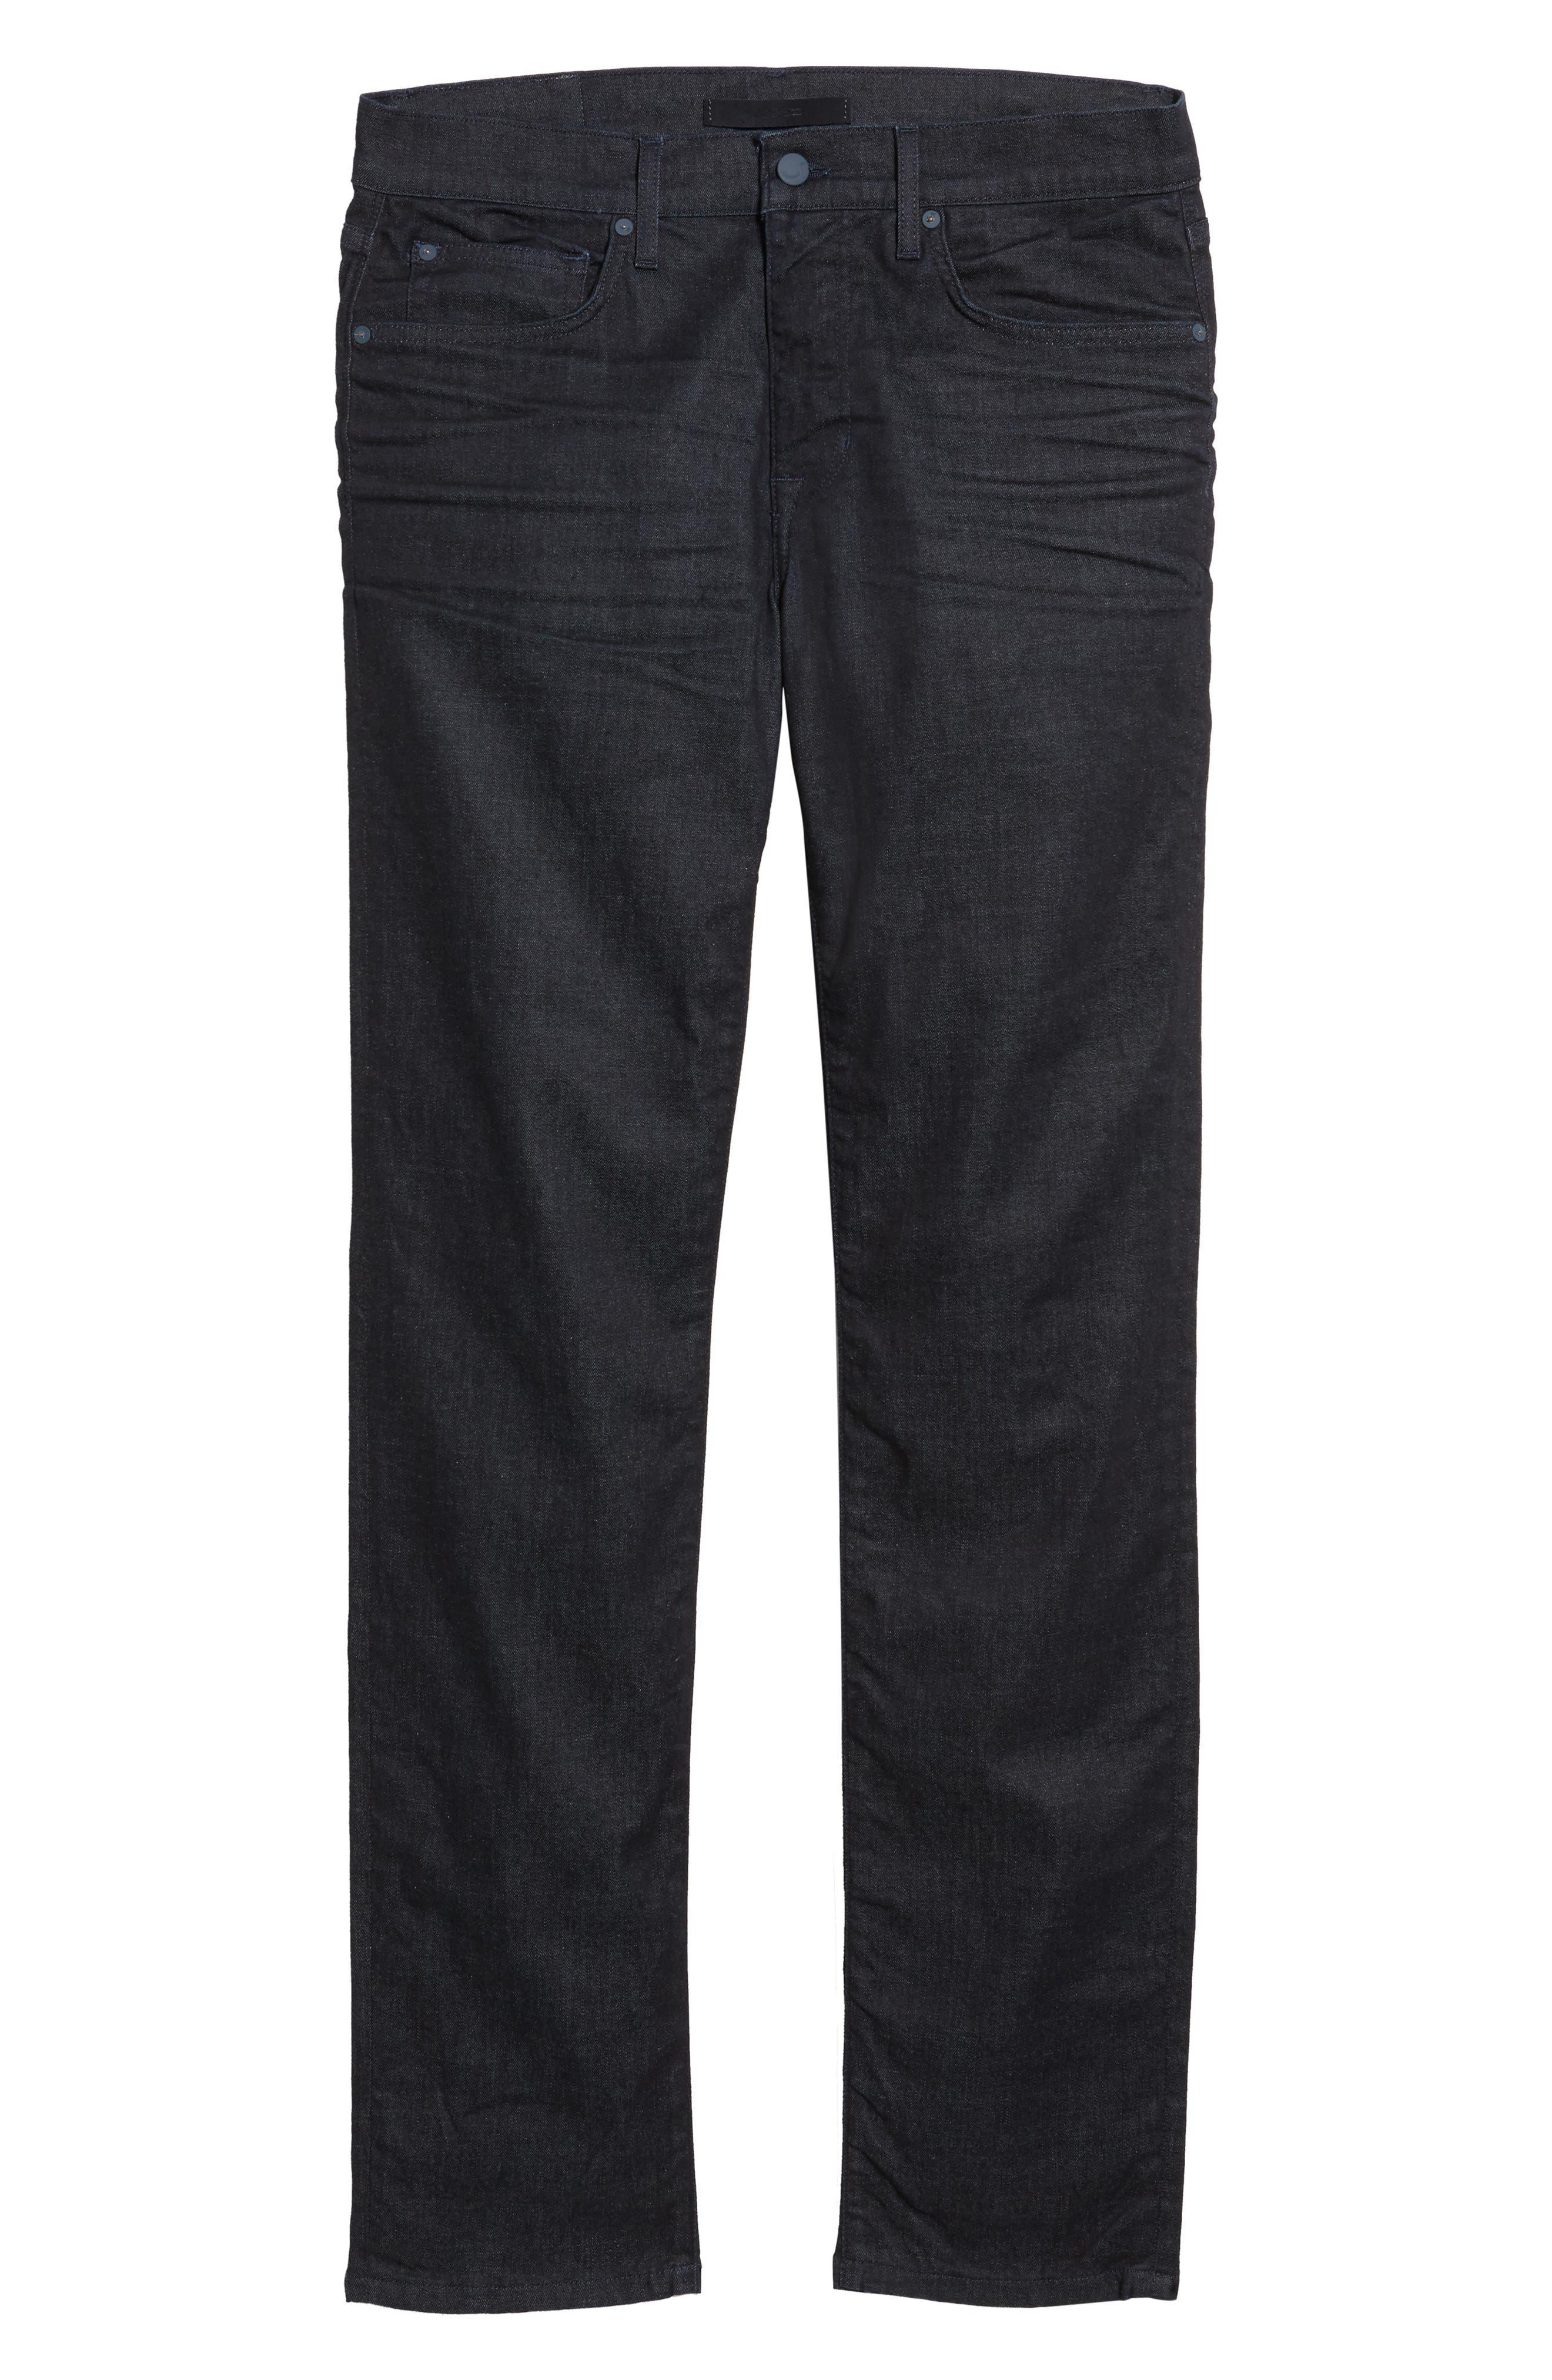 Brixton Slim Straight Fit Jeans,                             Alternate thumbnail 6, color,